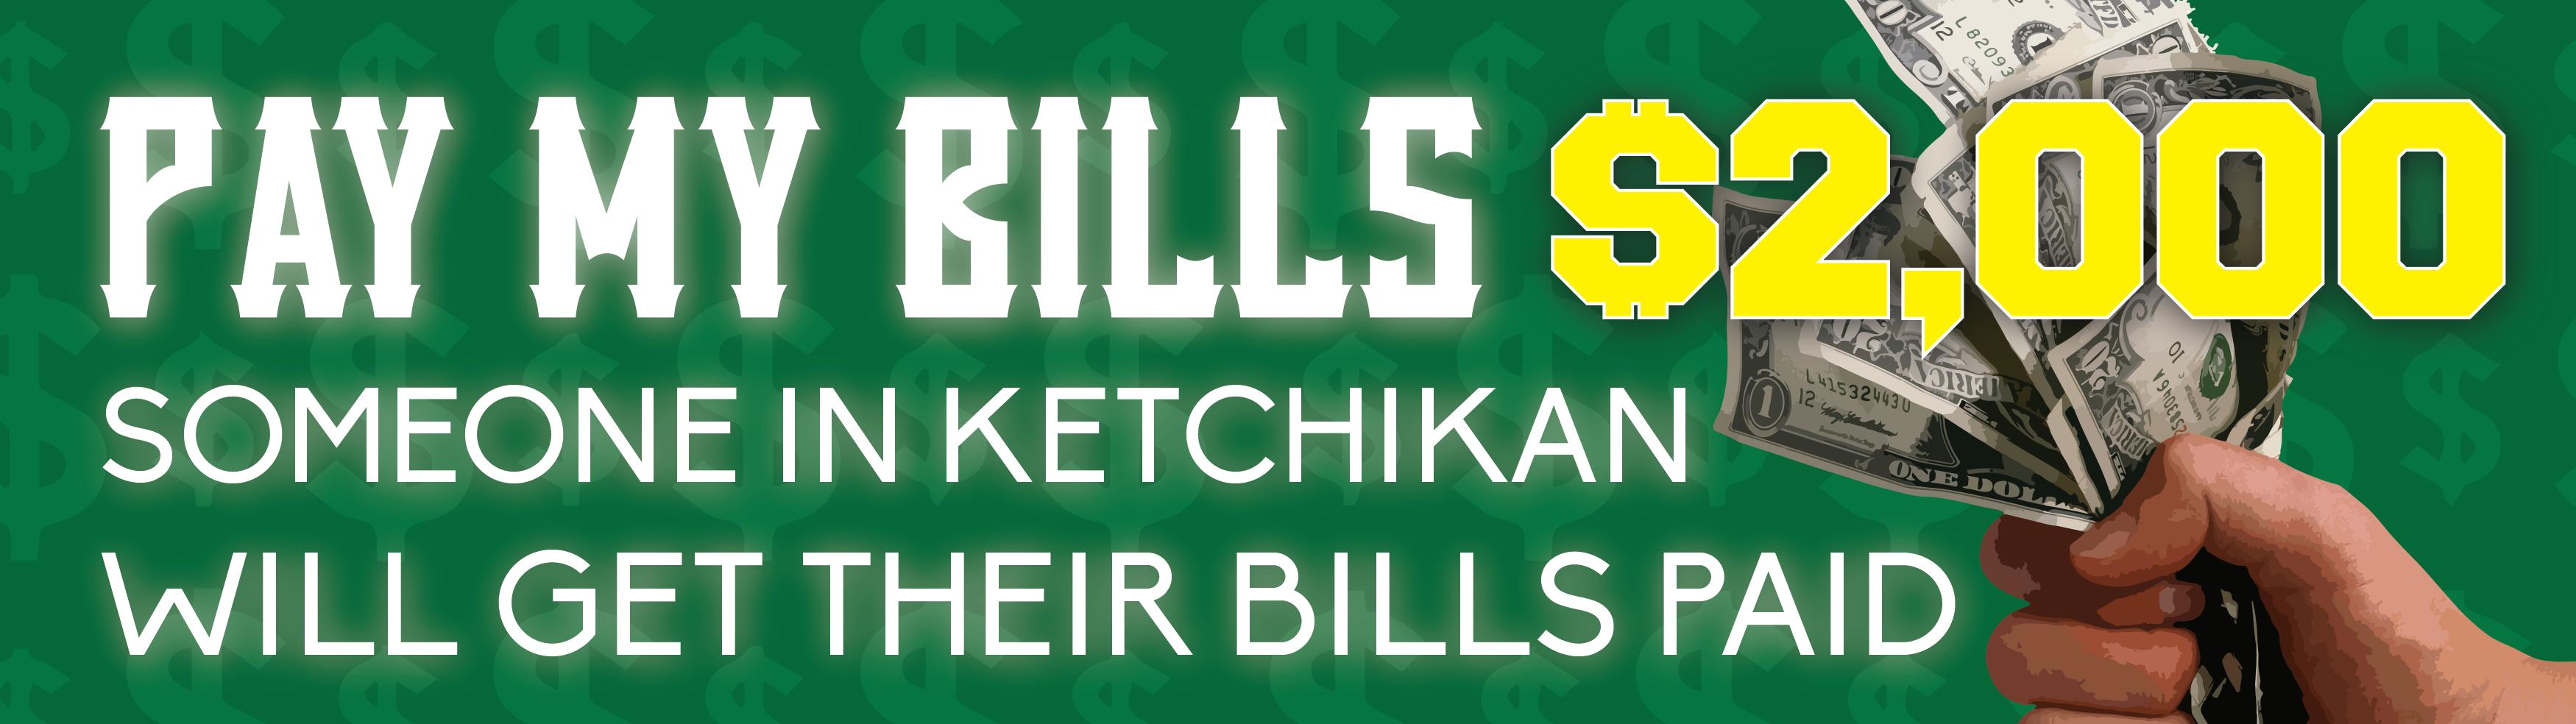 Pay My Bills - Ketchikan